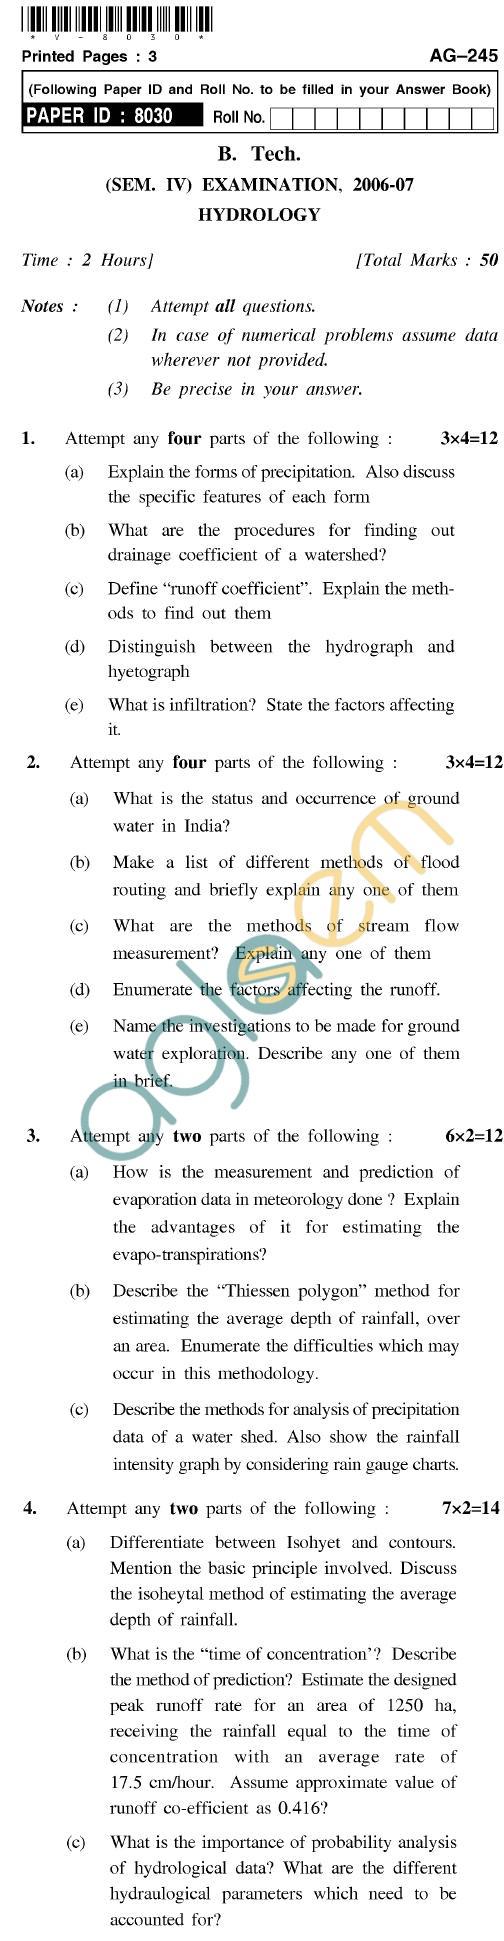 UPTU B.Tech Question Papers - AG-245 - Hydrology